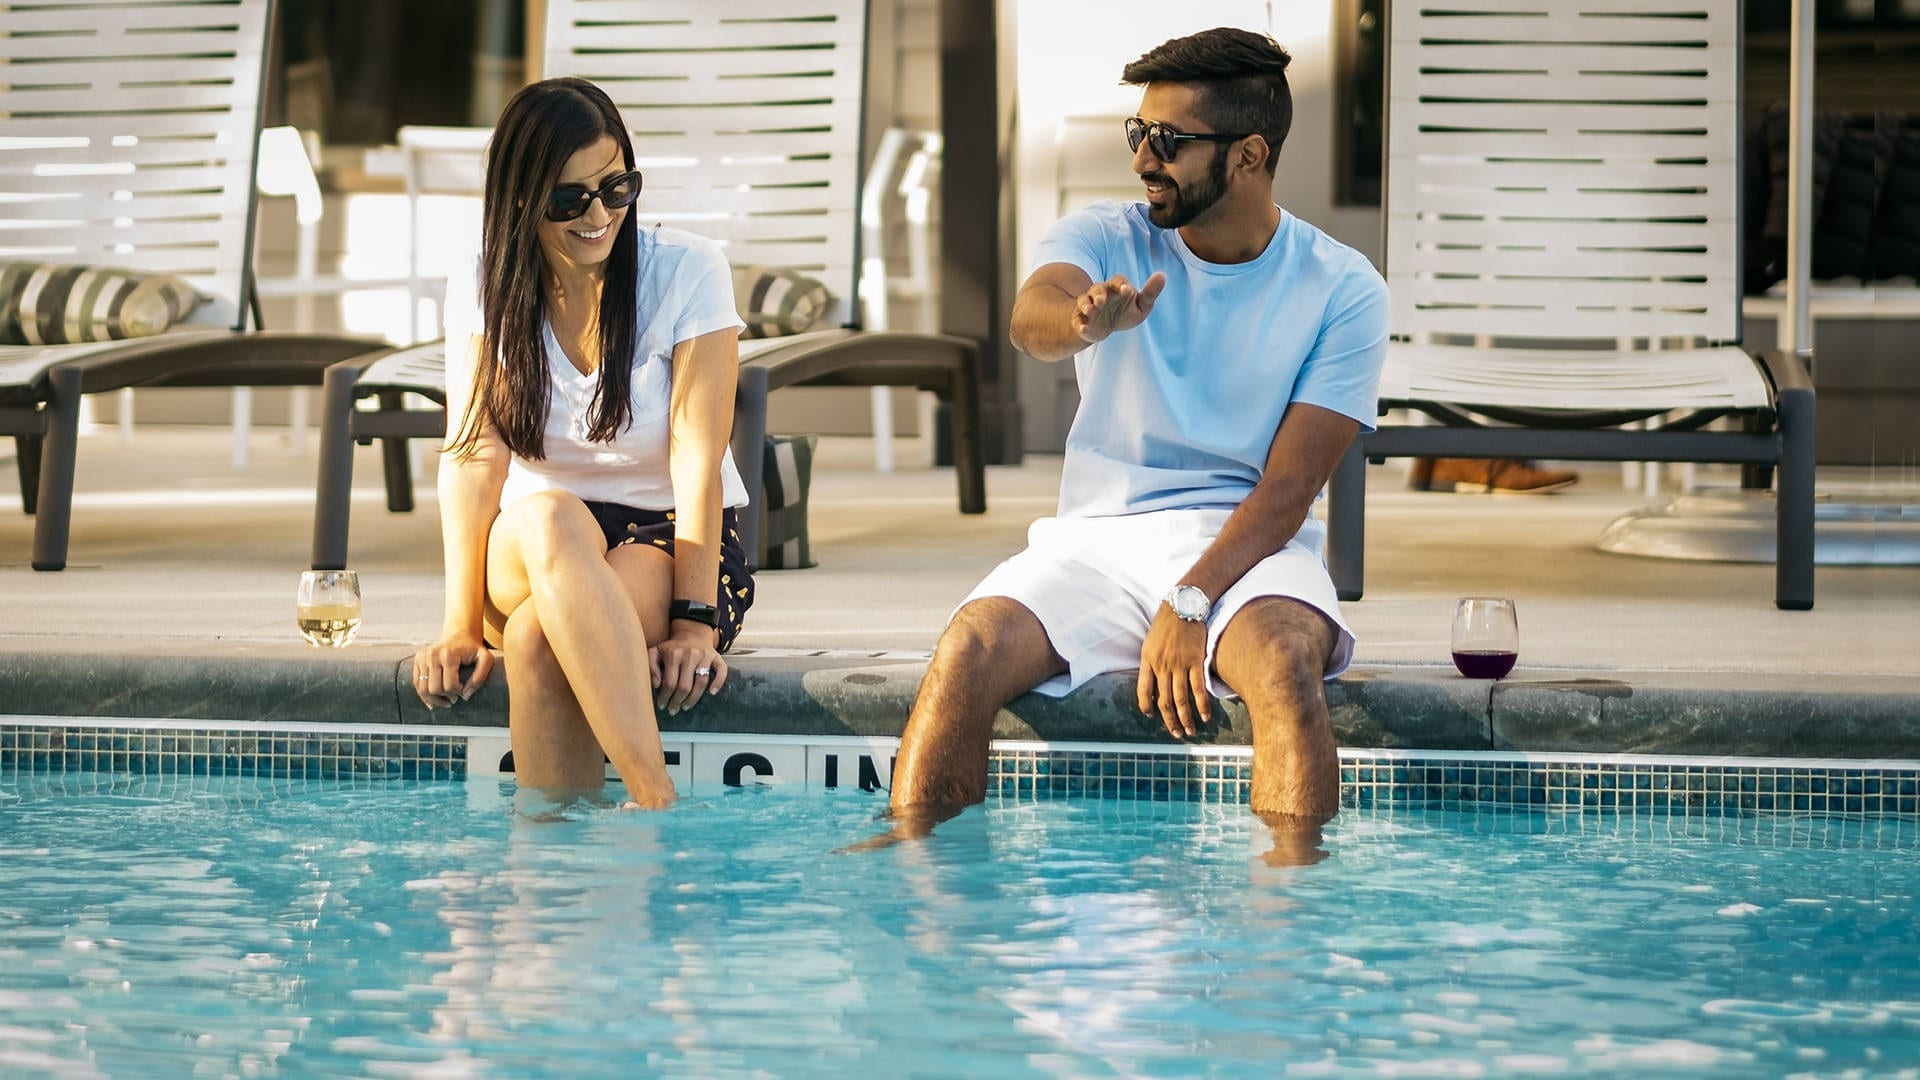 couple at pools edge